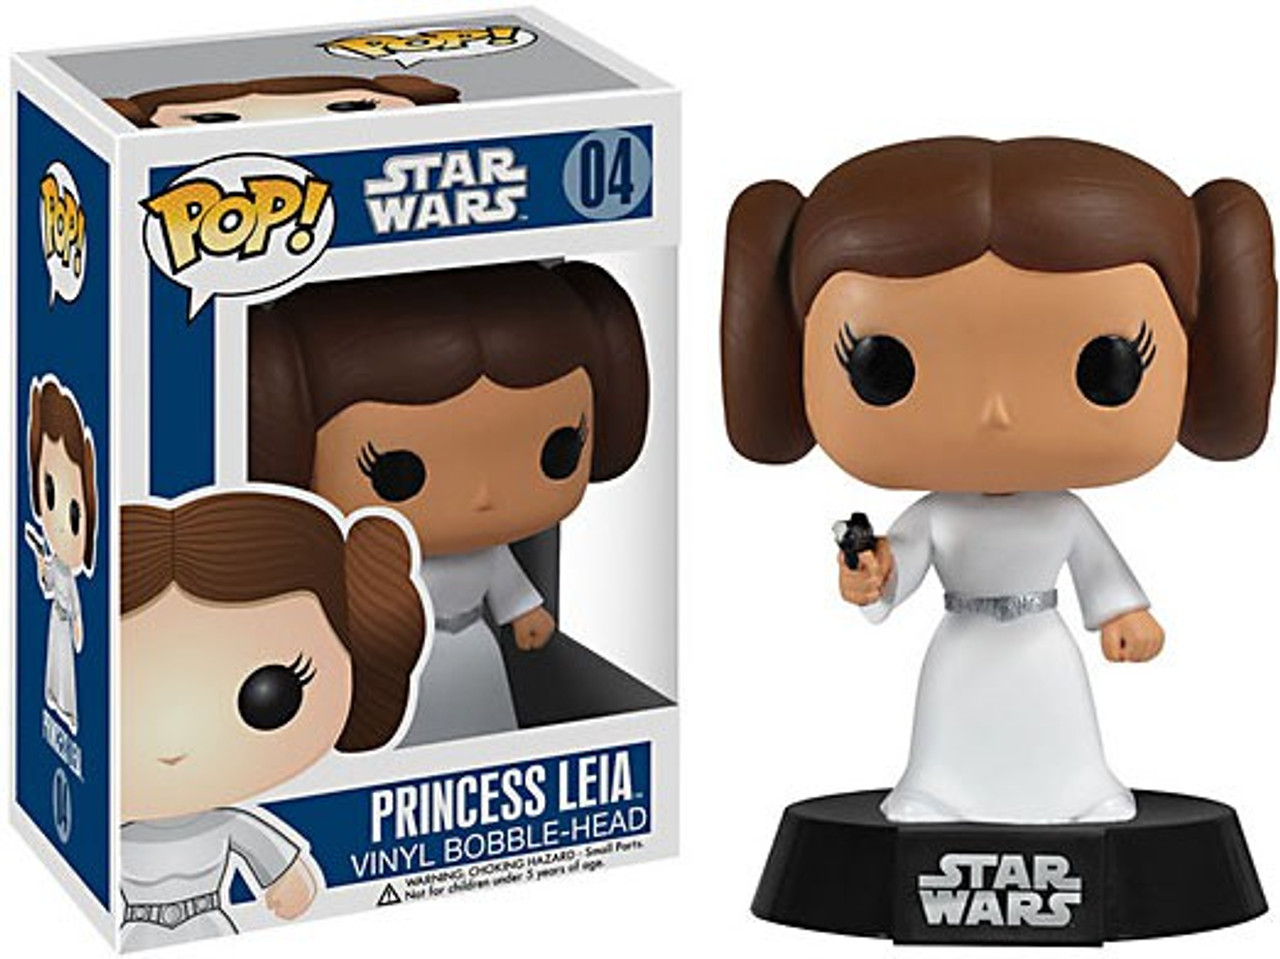 Funko POP! Star Wars Princess Leia Vinyl Bobble Head #04